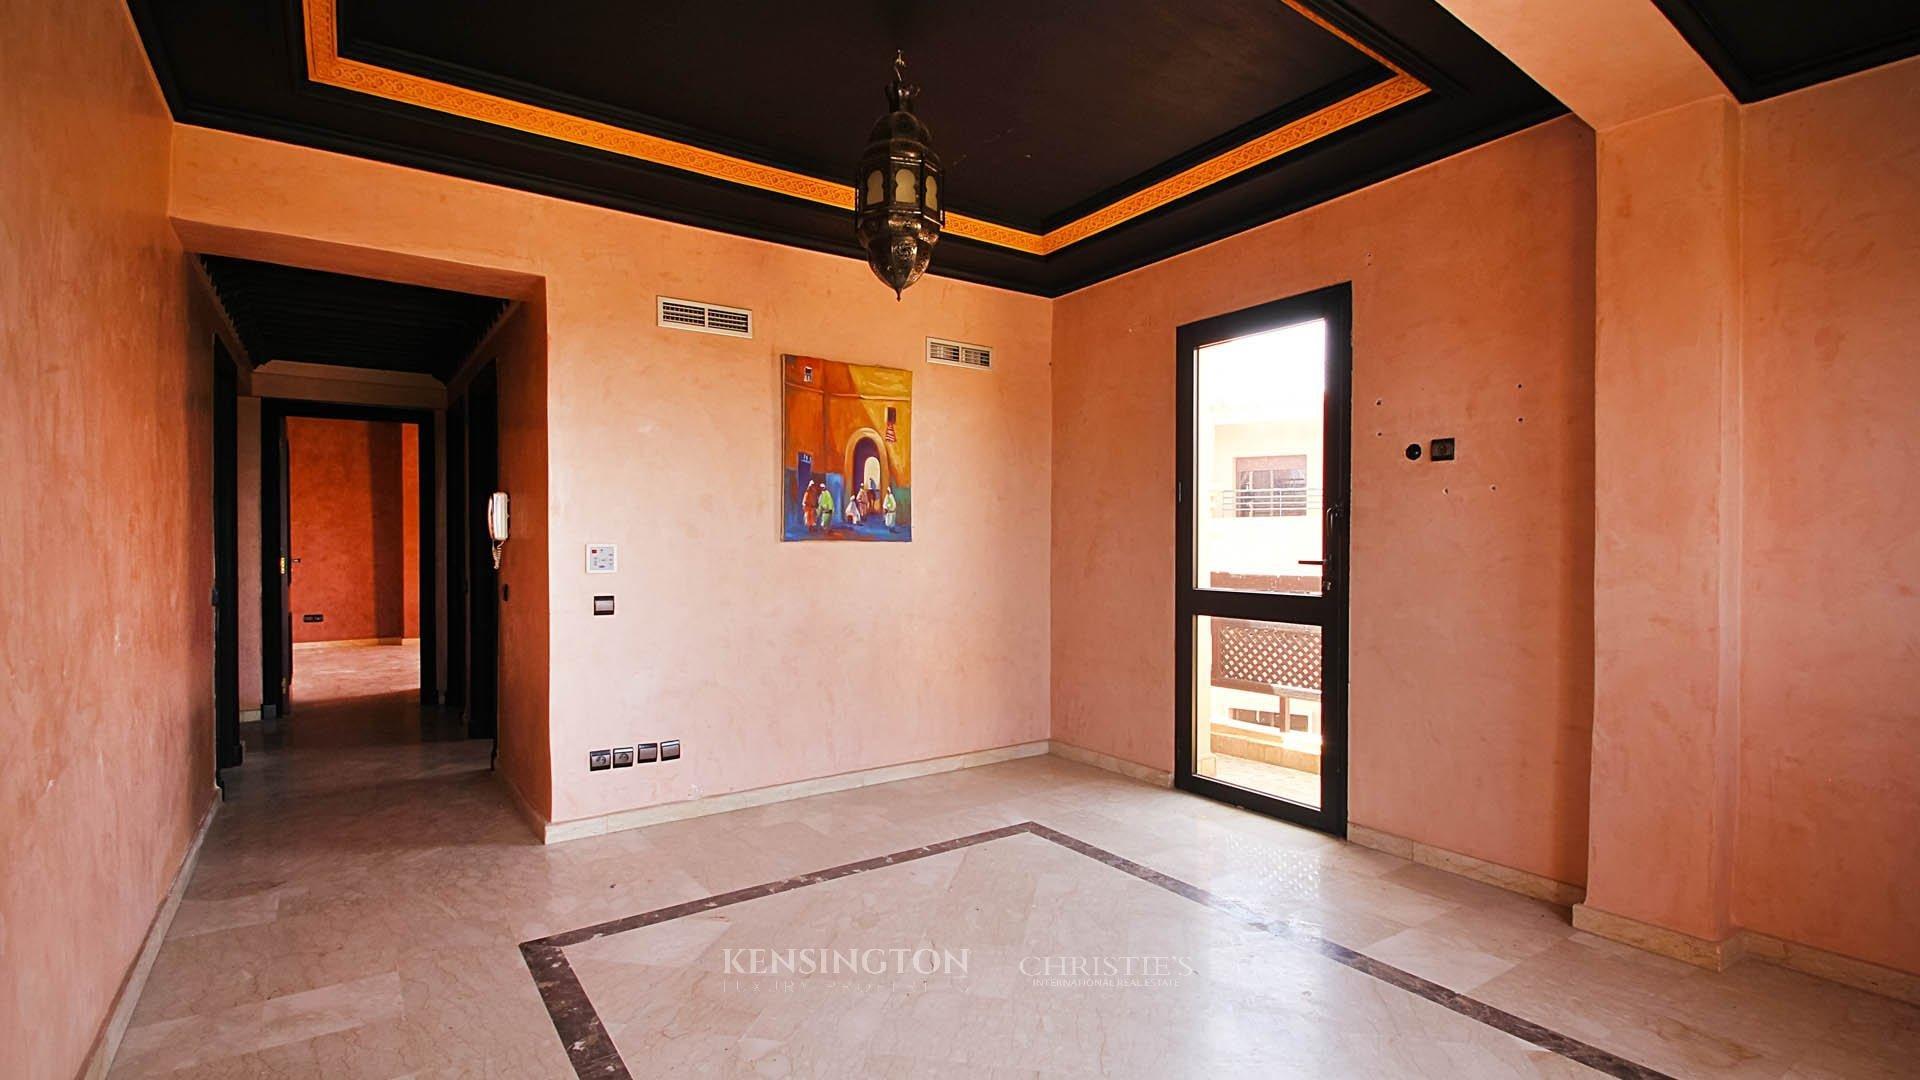 KPPM01212: Apartment Frexa Apartment Marrakech Morocco